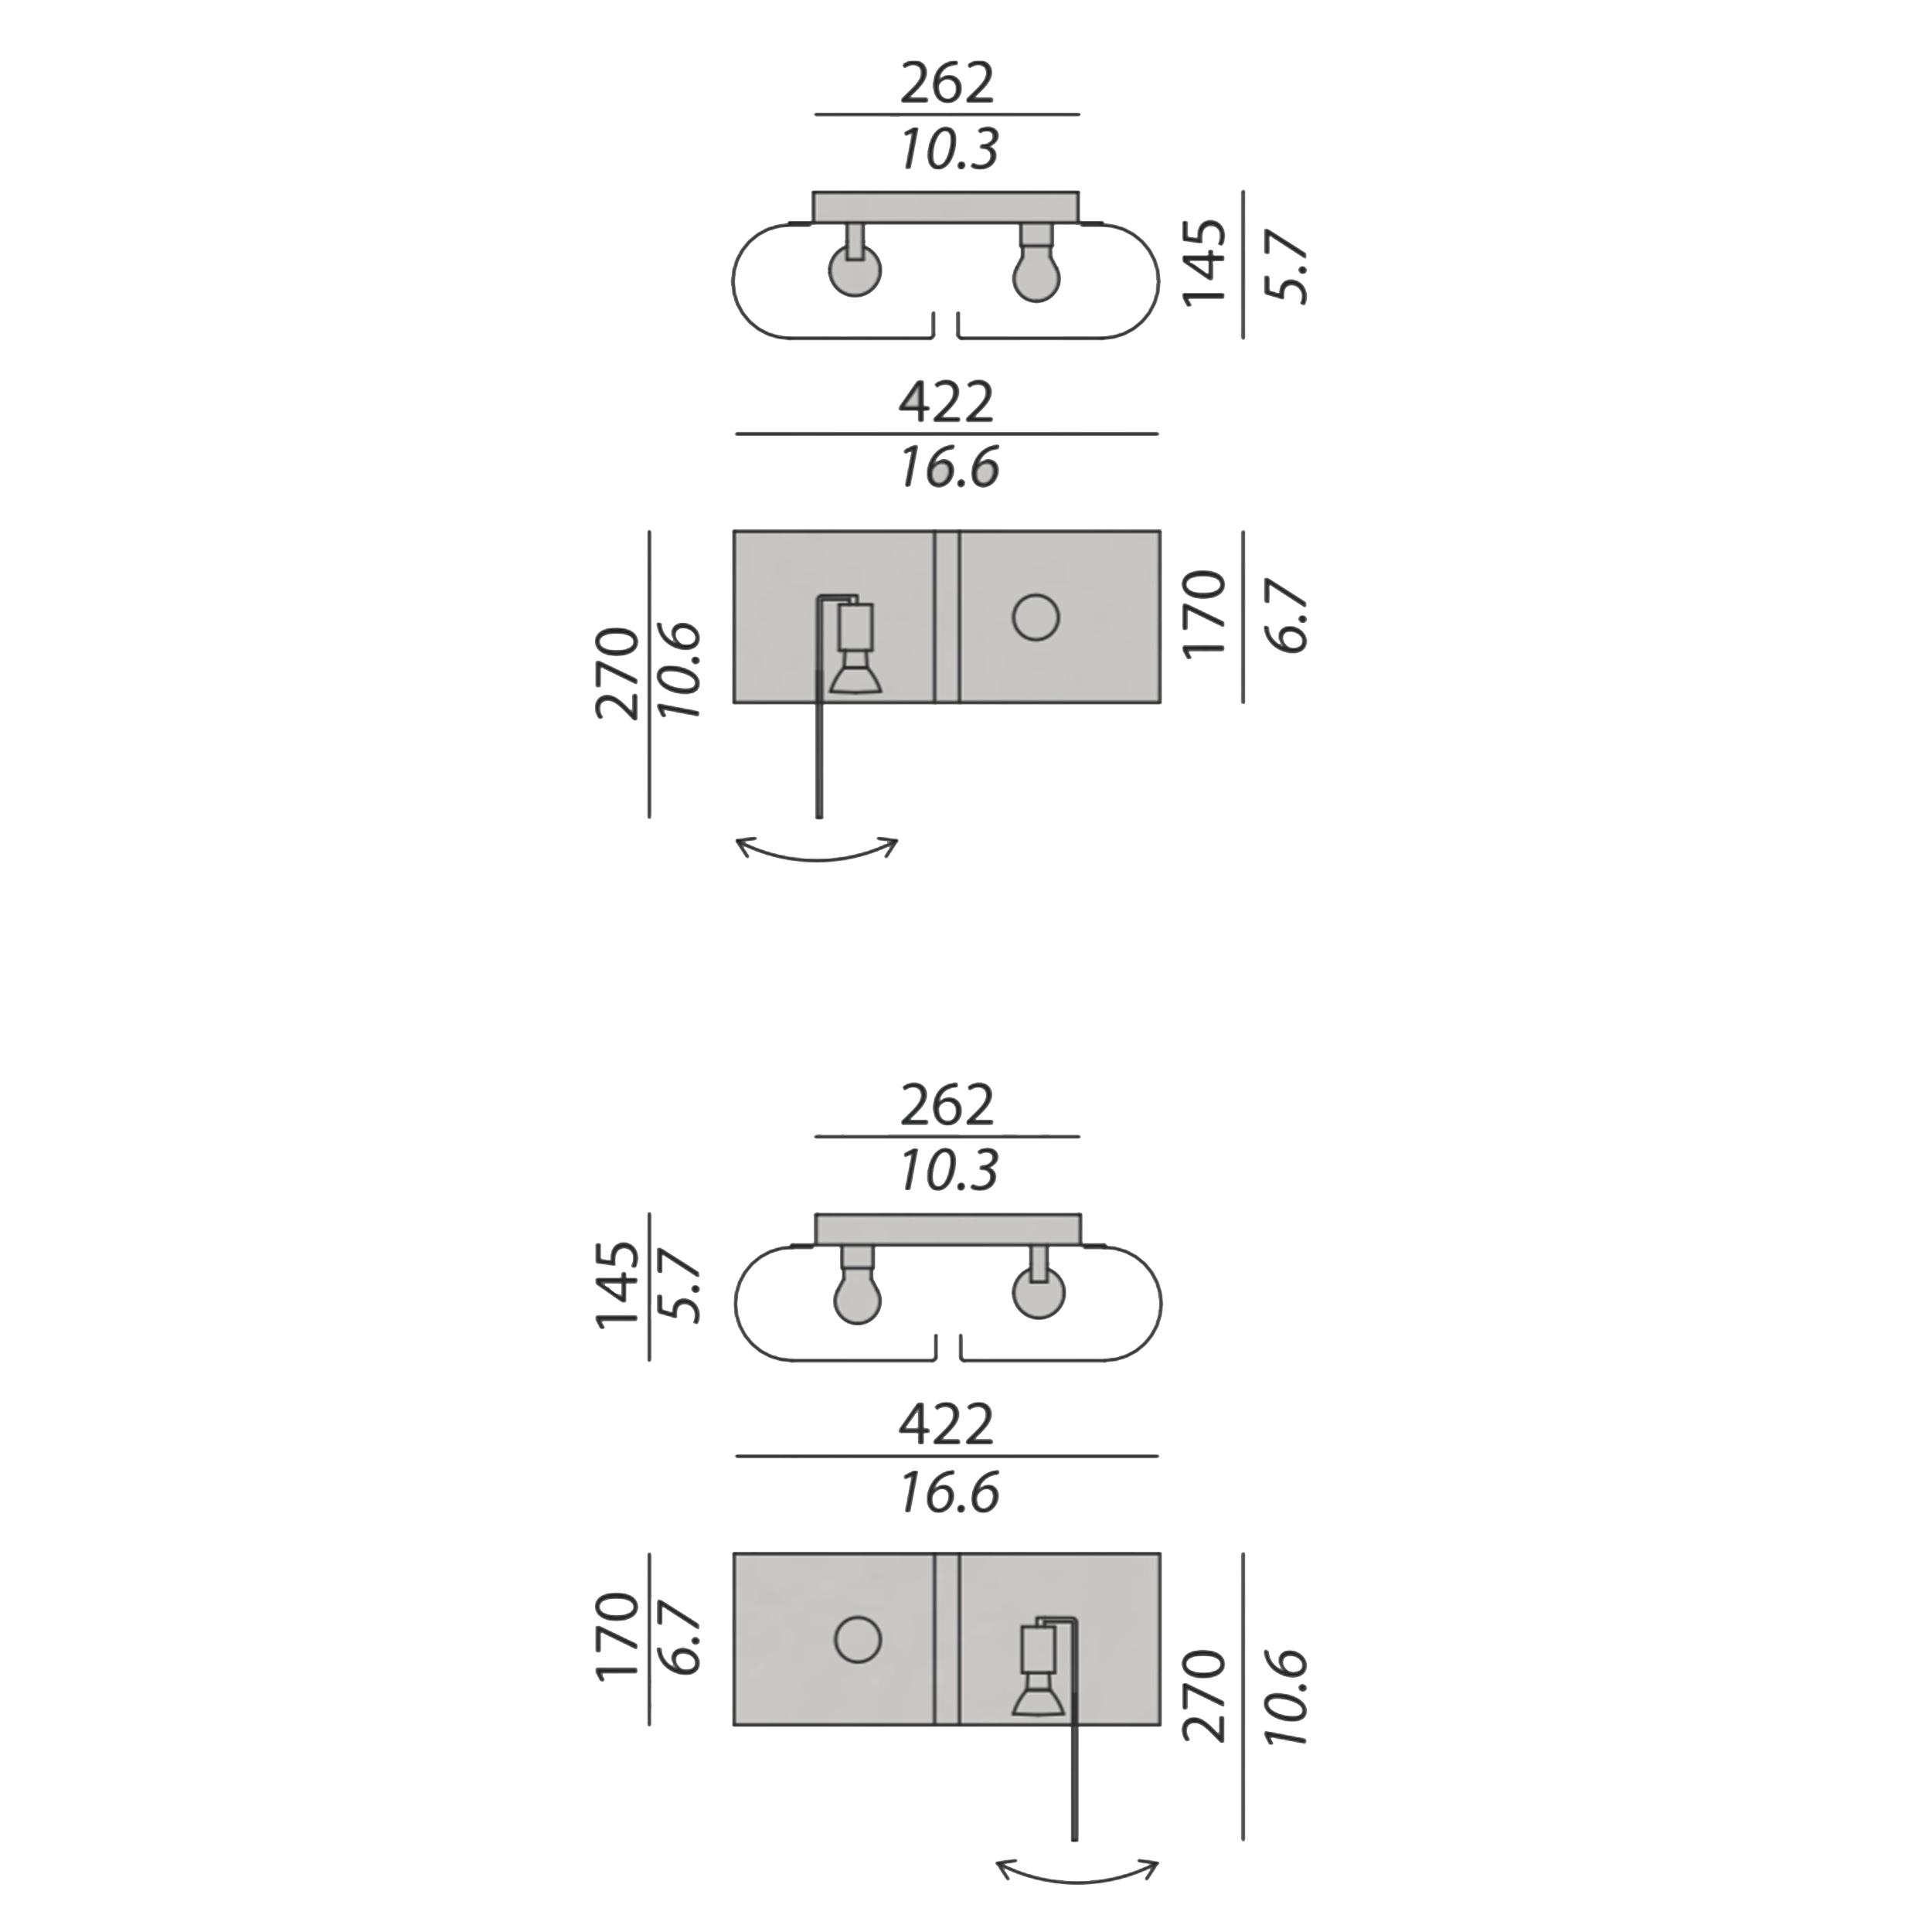 Contardi Duos Ap Wall Light Line Drawing